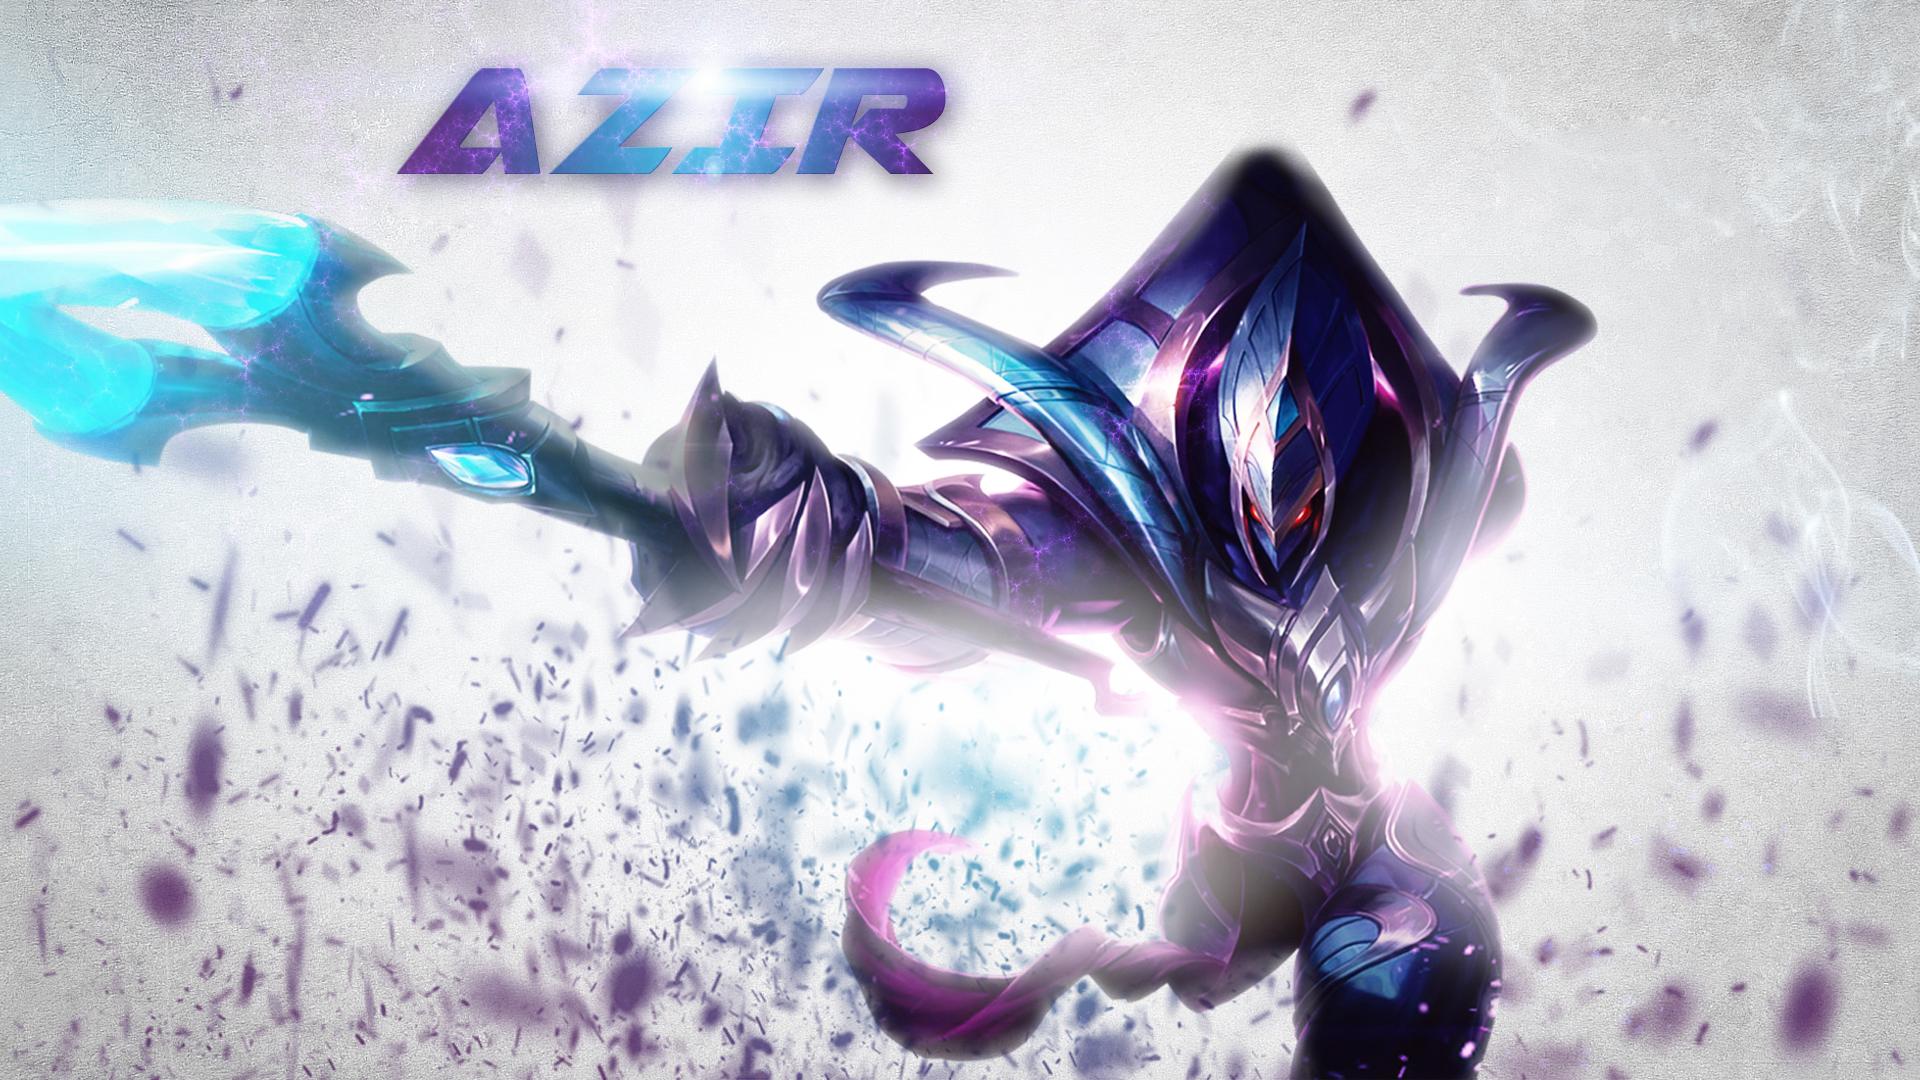 Galactic Azir wallpaper